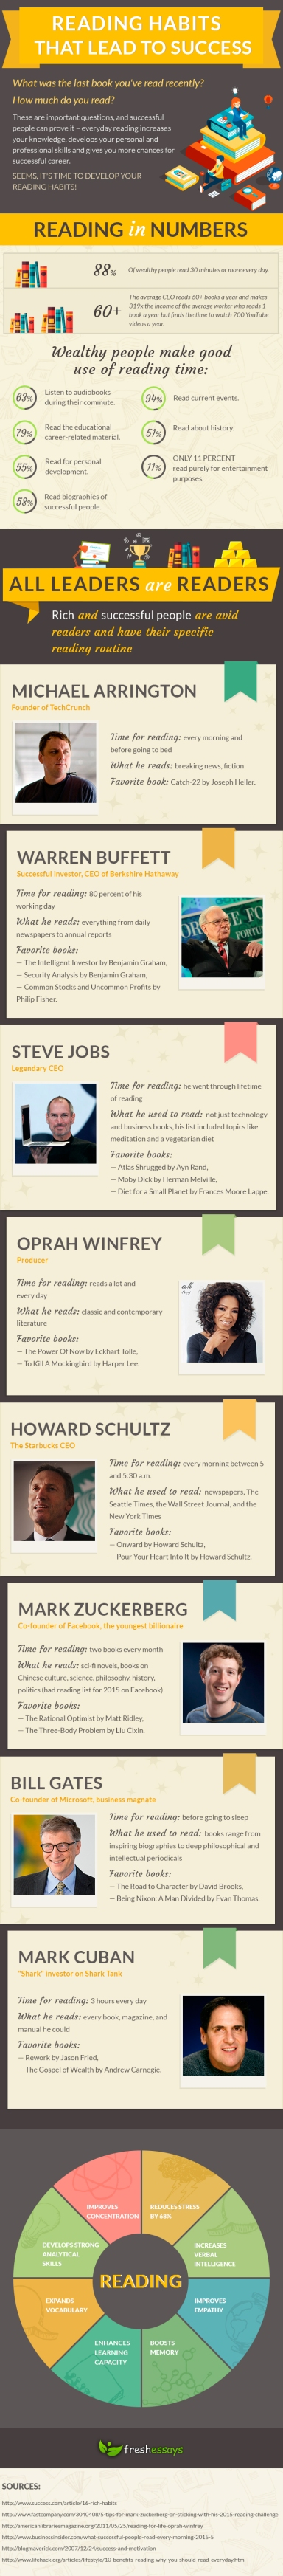 reading-habits-lead-success